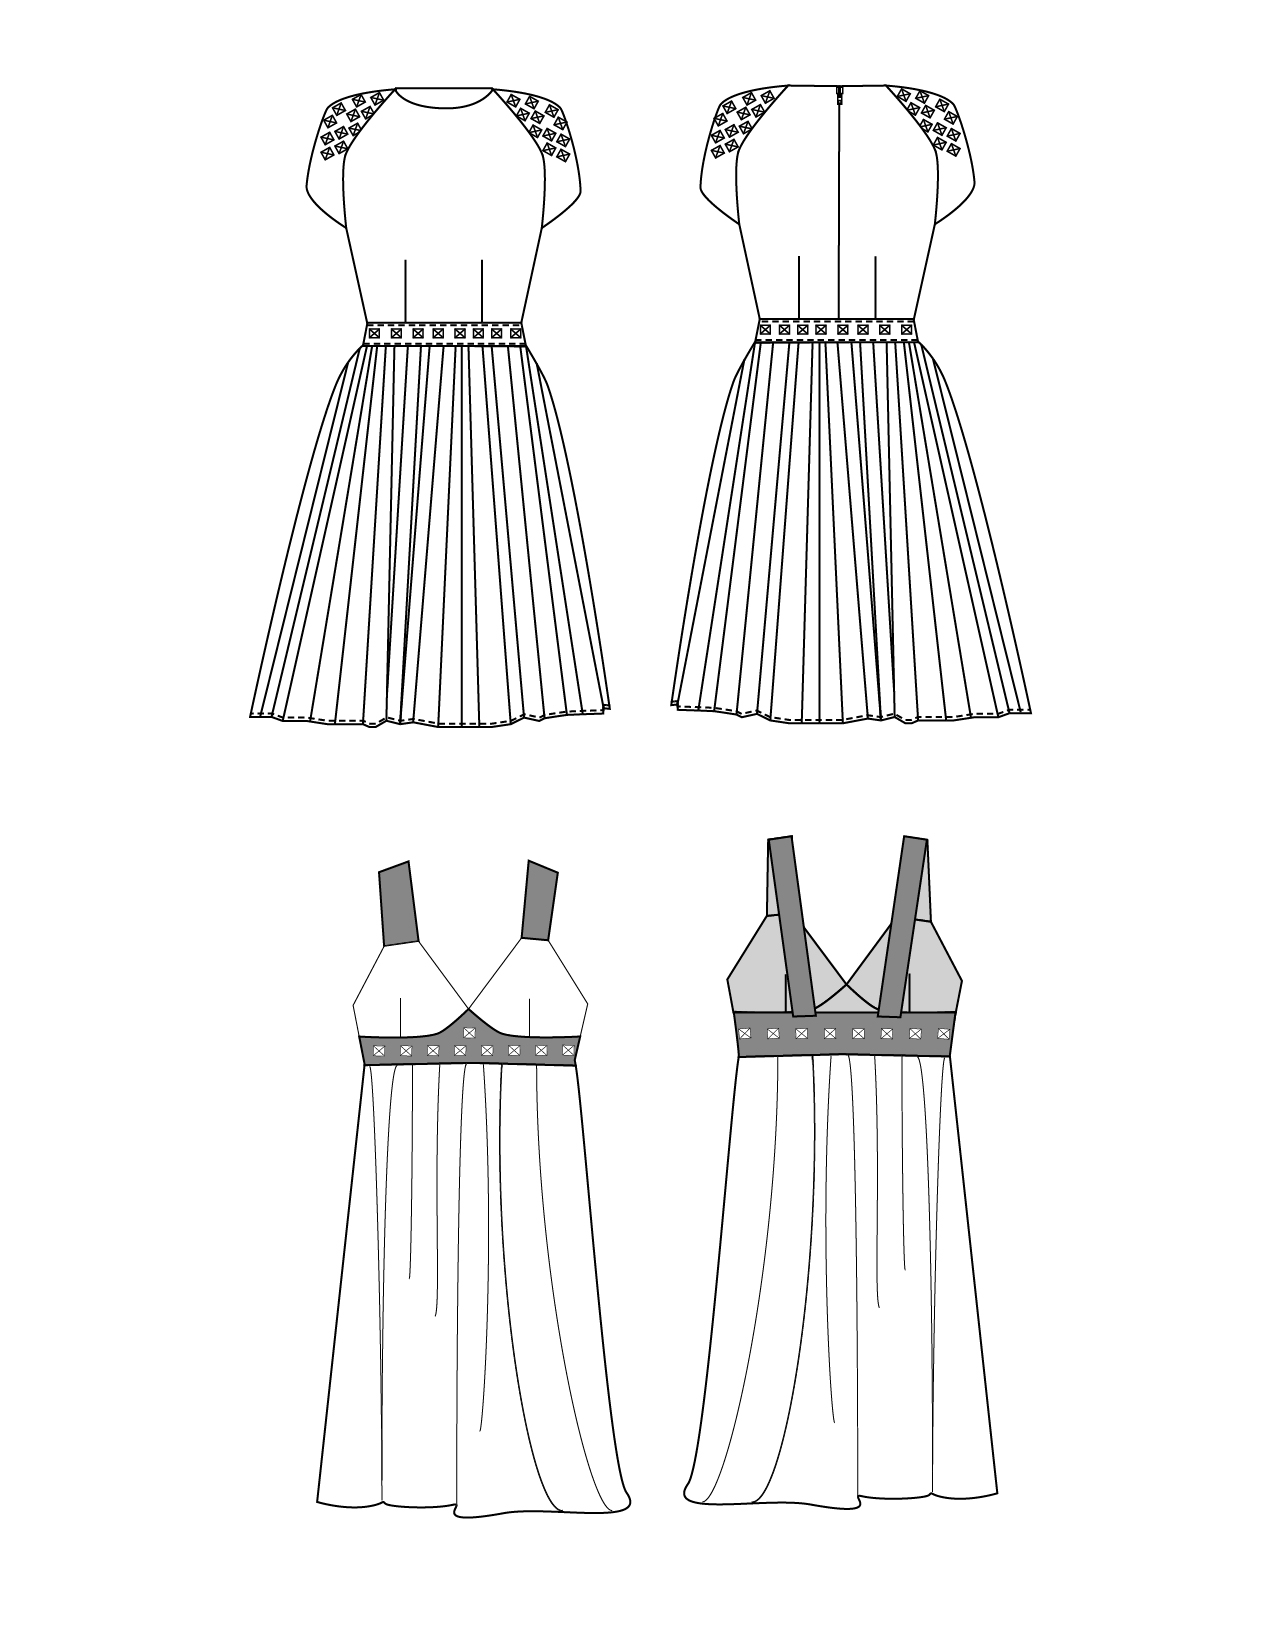 fashion-illustrations-01.jpg